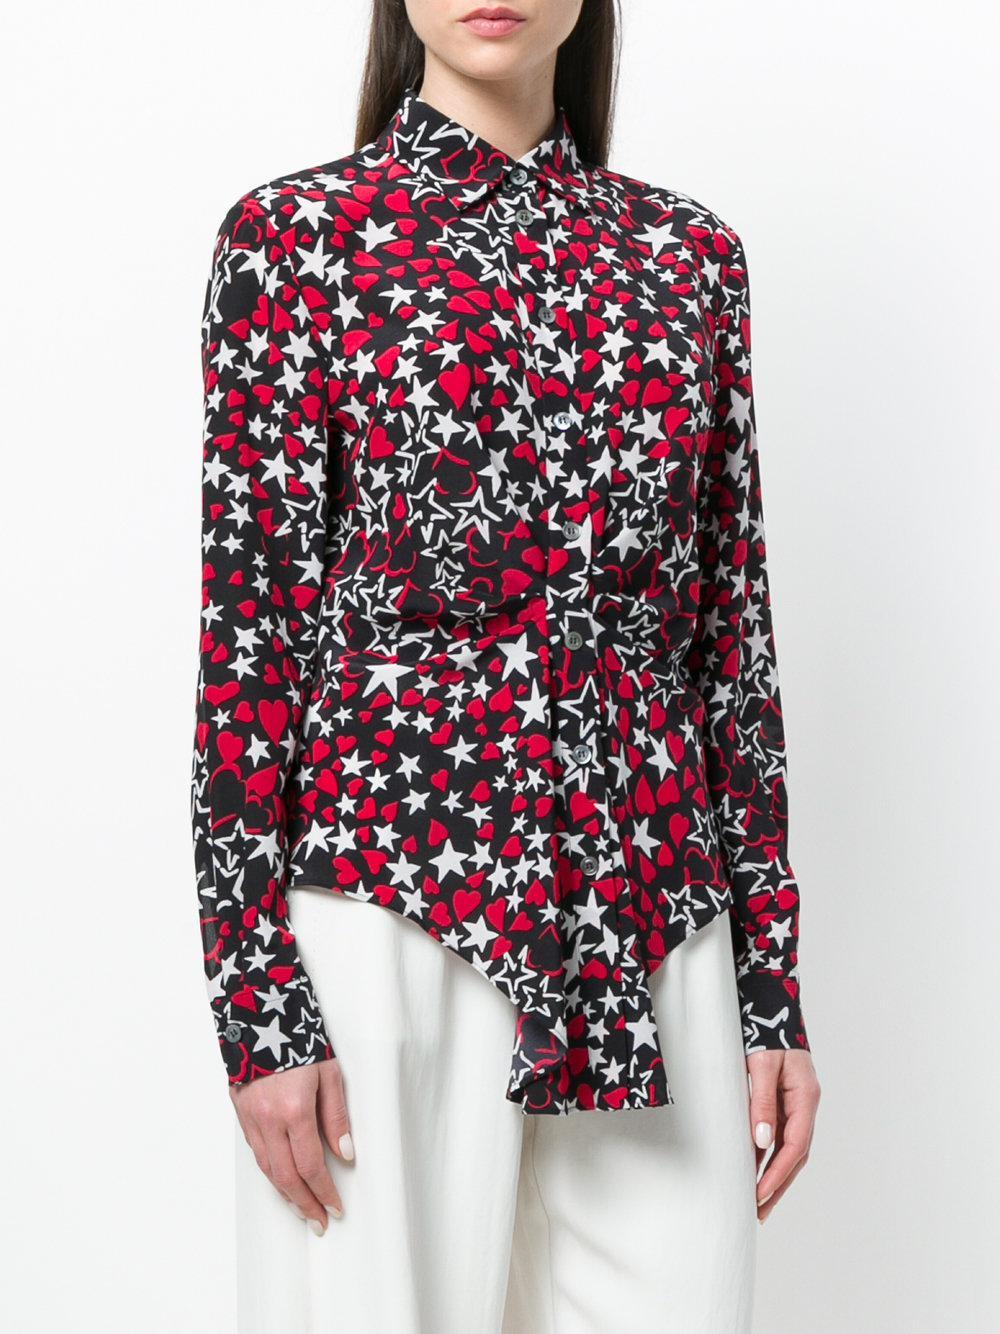 999c5a077882 rossella-jardini-black-Star-And-Heart-Printed-Shirt.jpeg